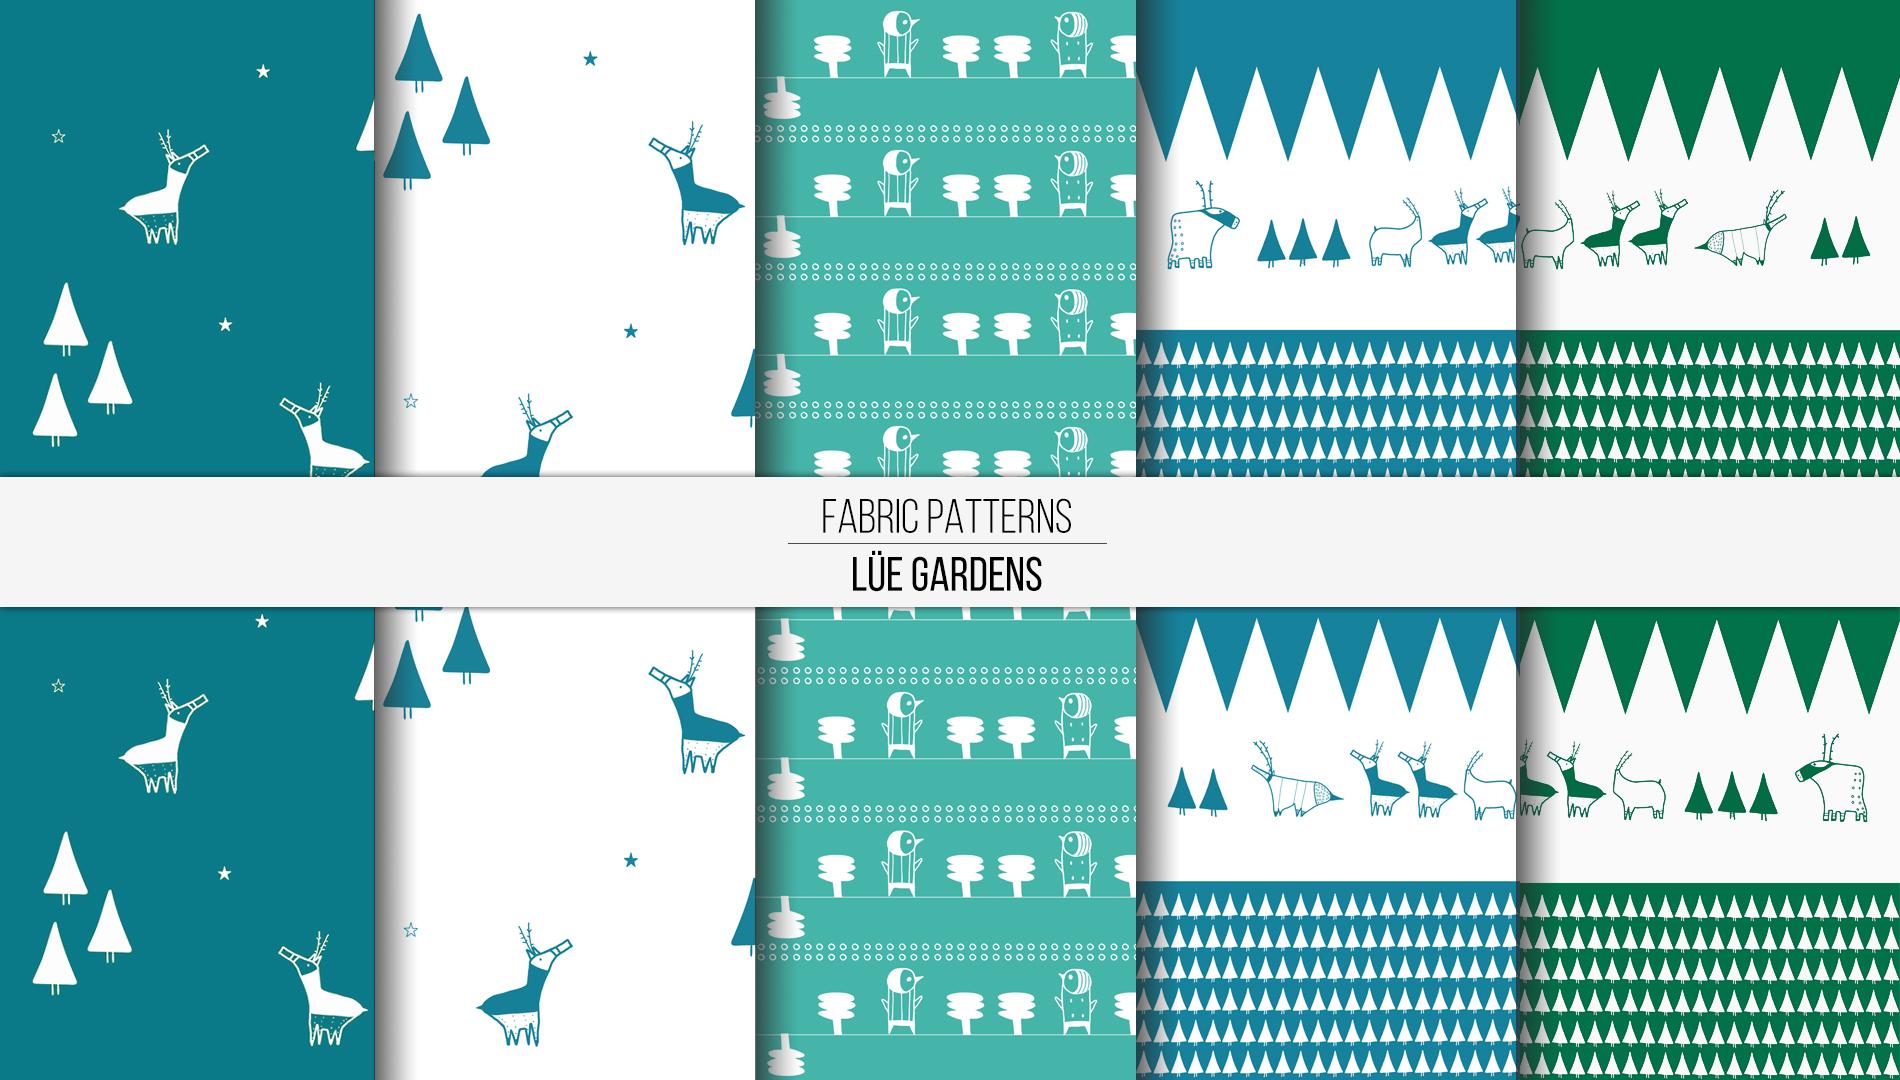 fabricpatterns-3